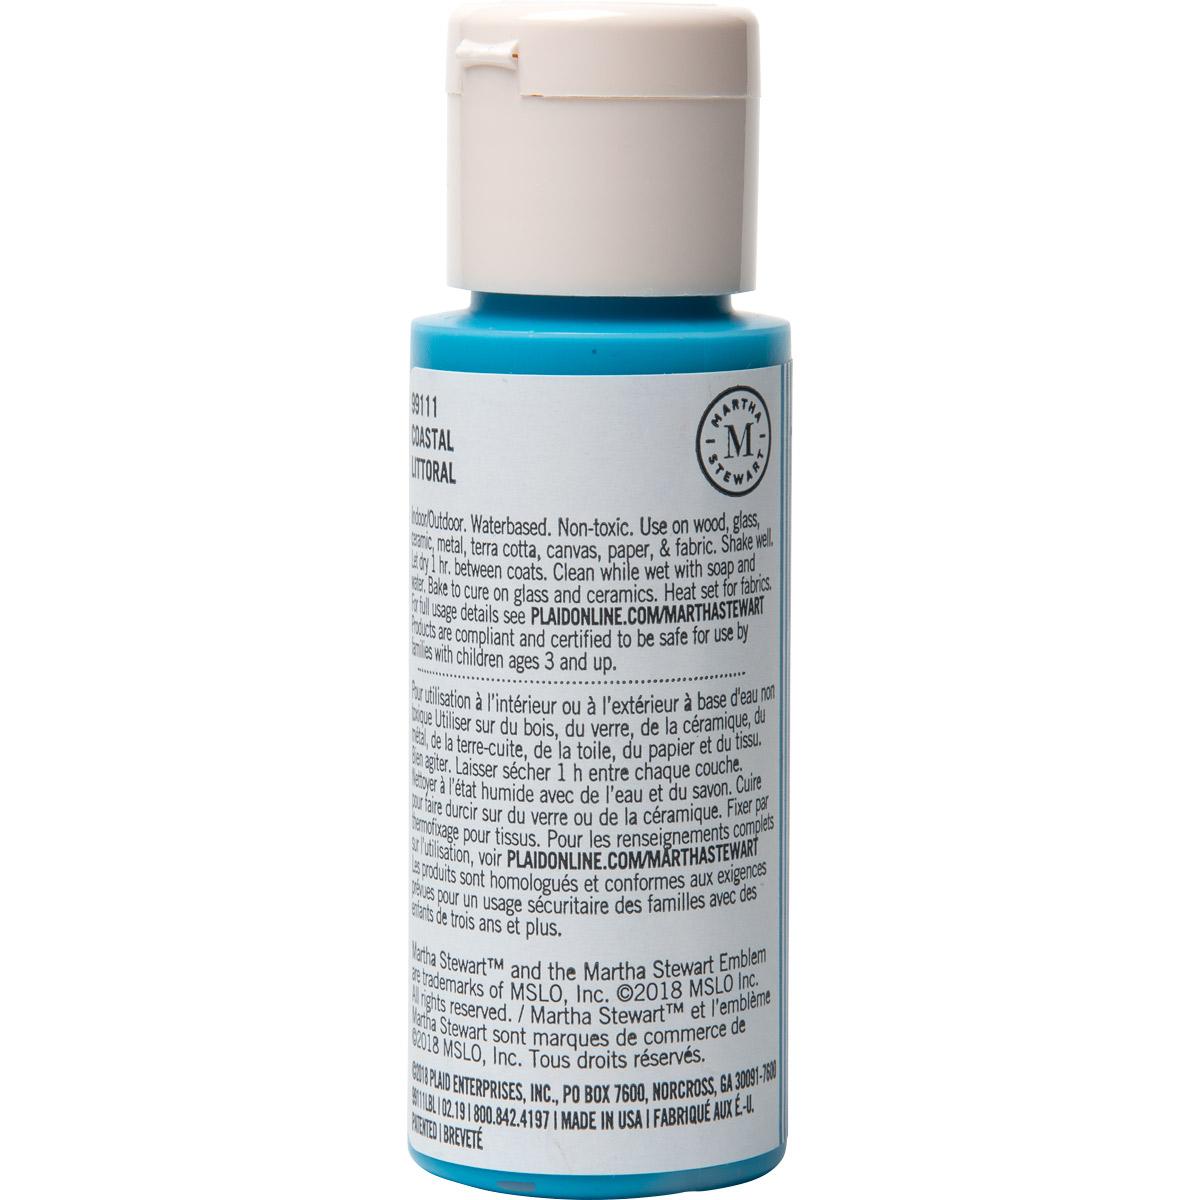 Martha Stewart ® Multi-Surface Satin Acrylic Craft Paint CPSIA - Coastal, 2 oz. - 99111